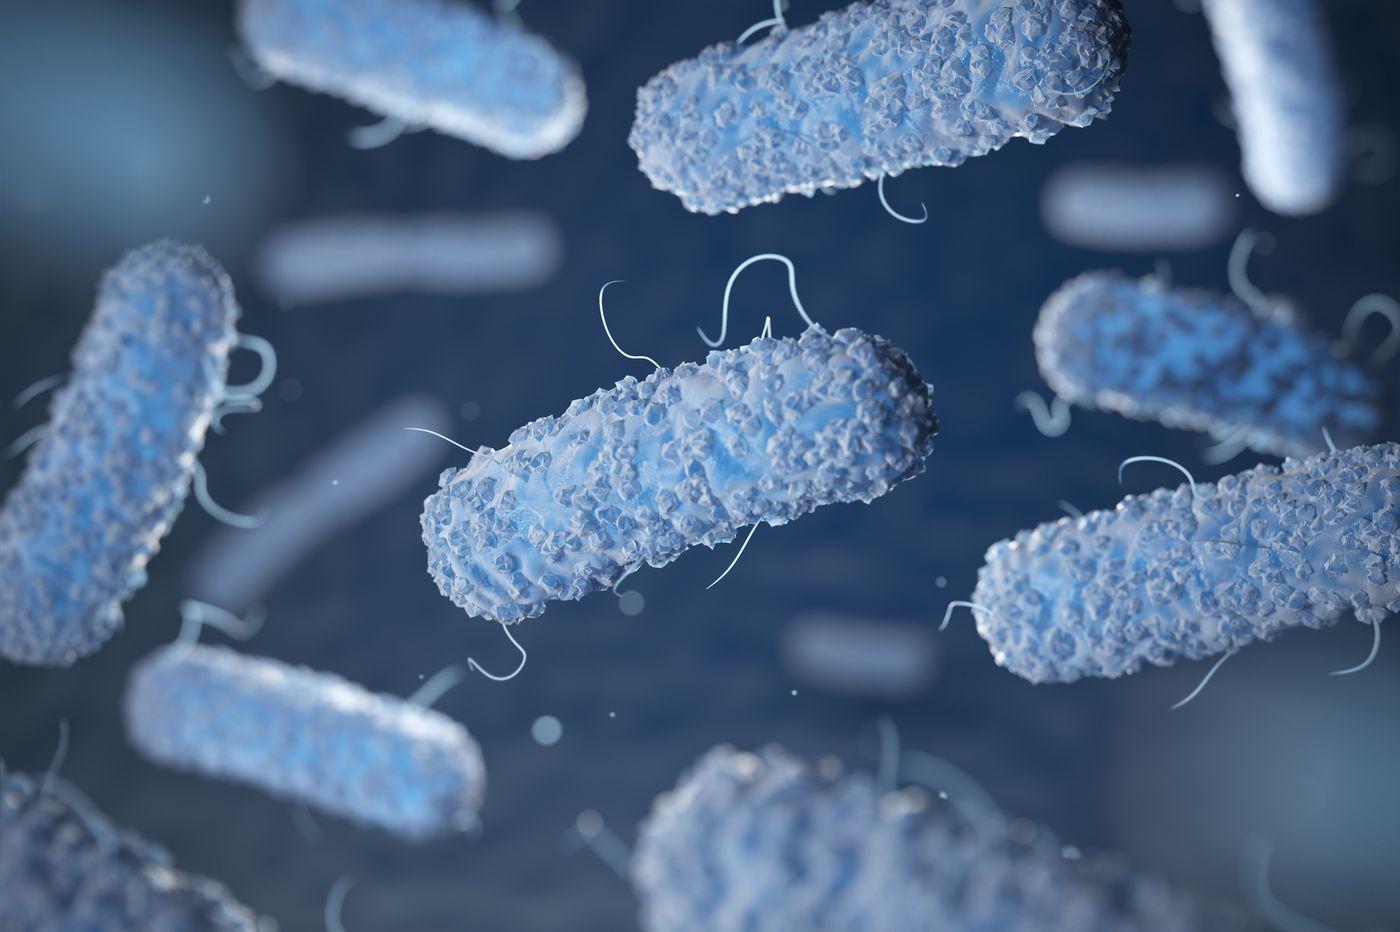 Philadelphia officials issue health alert over E. coli outbreak